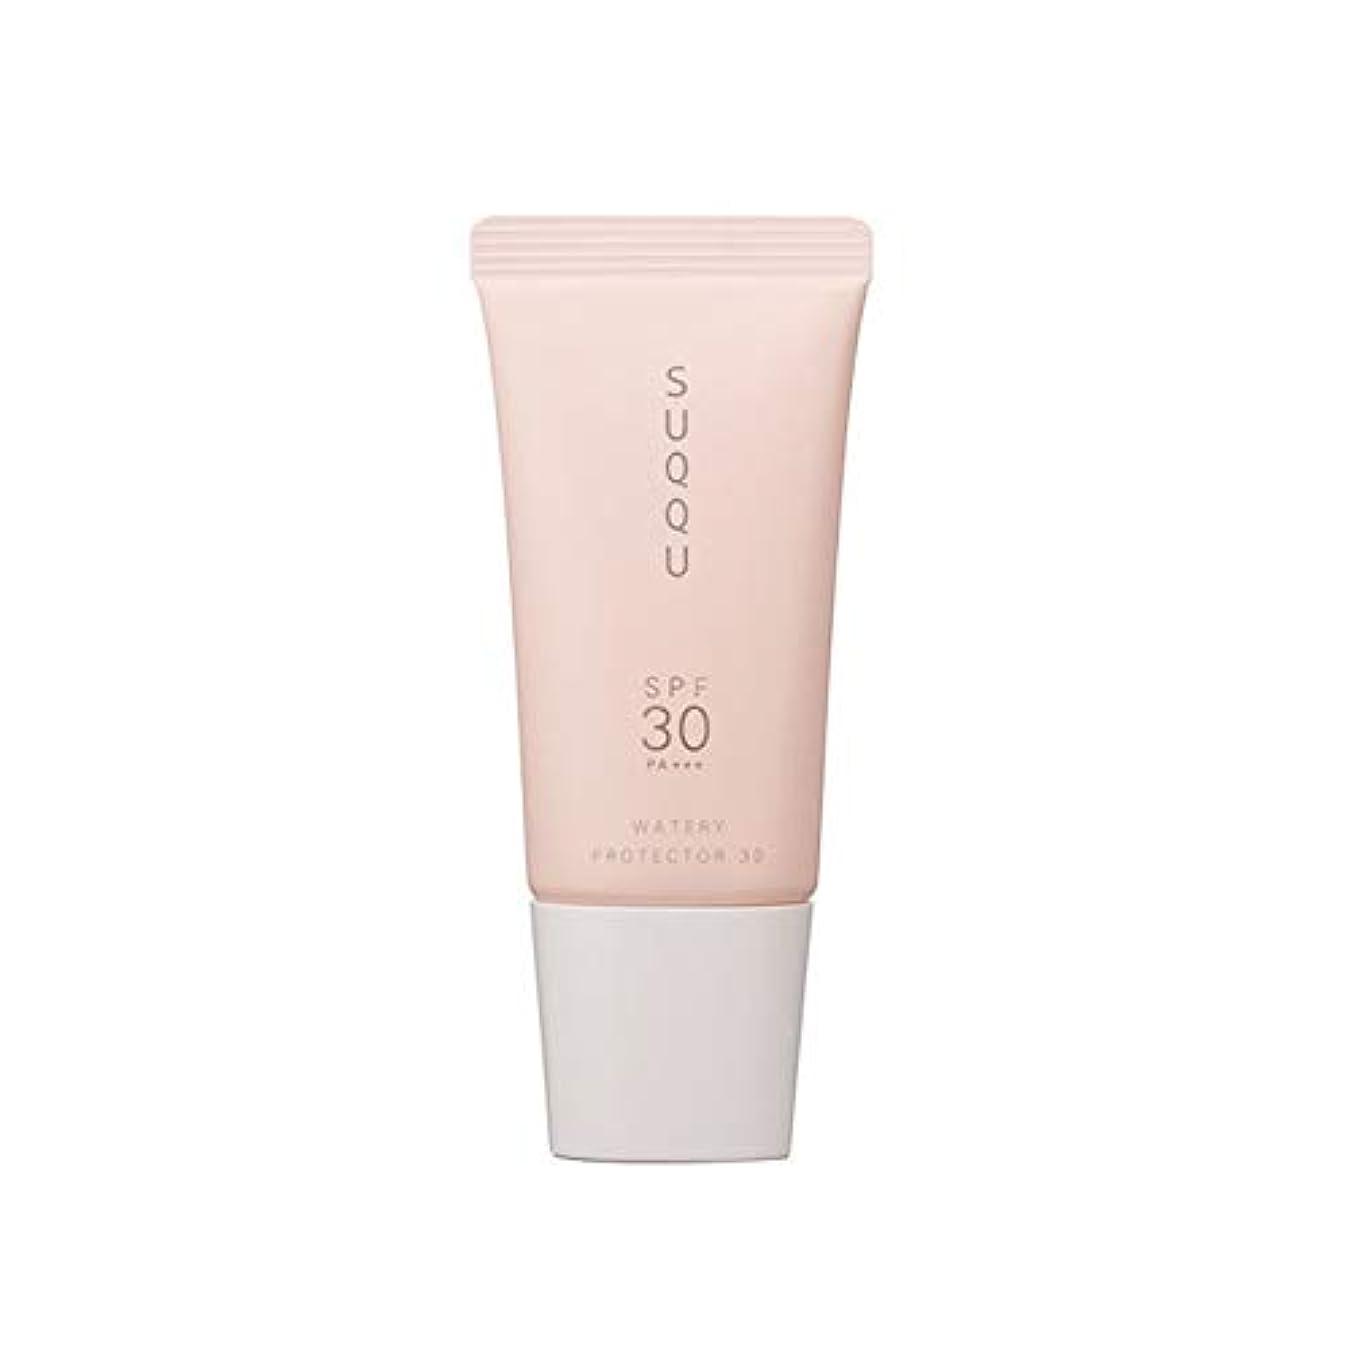 SUQQU(スック)UV ウォータリー プロテクター 30 [ 日焼け止め ] [並行輸入品]